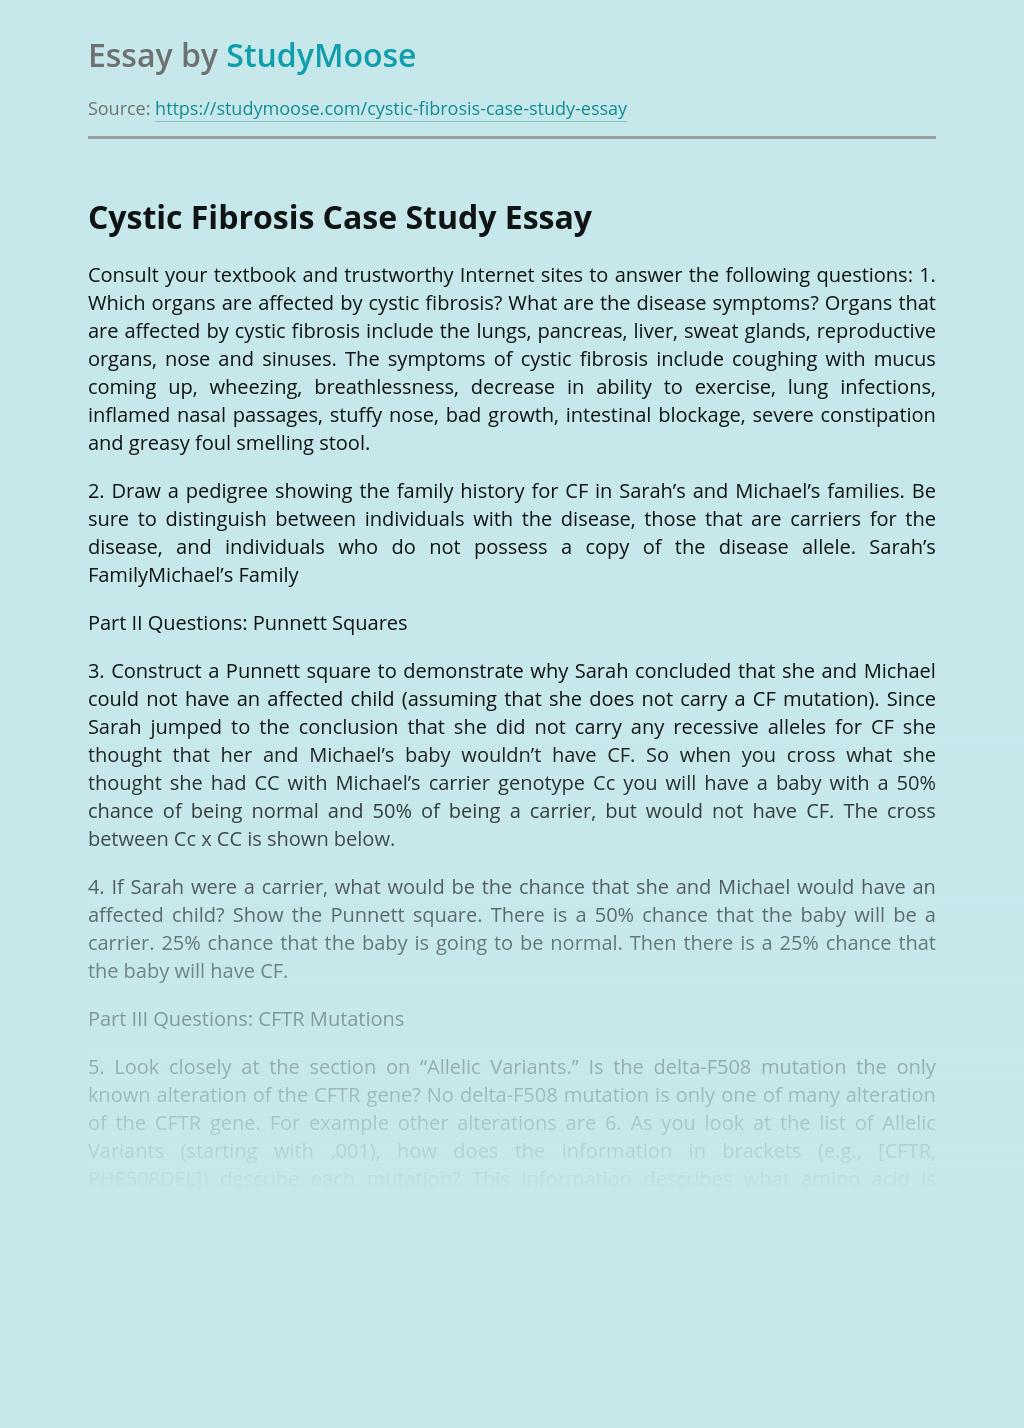 Cystic Fibrosis Case Study